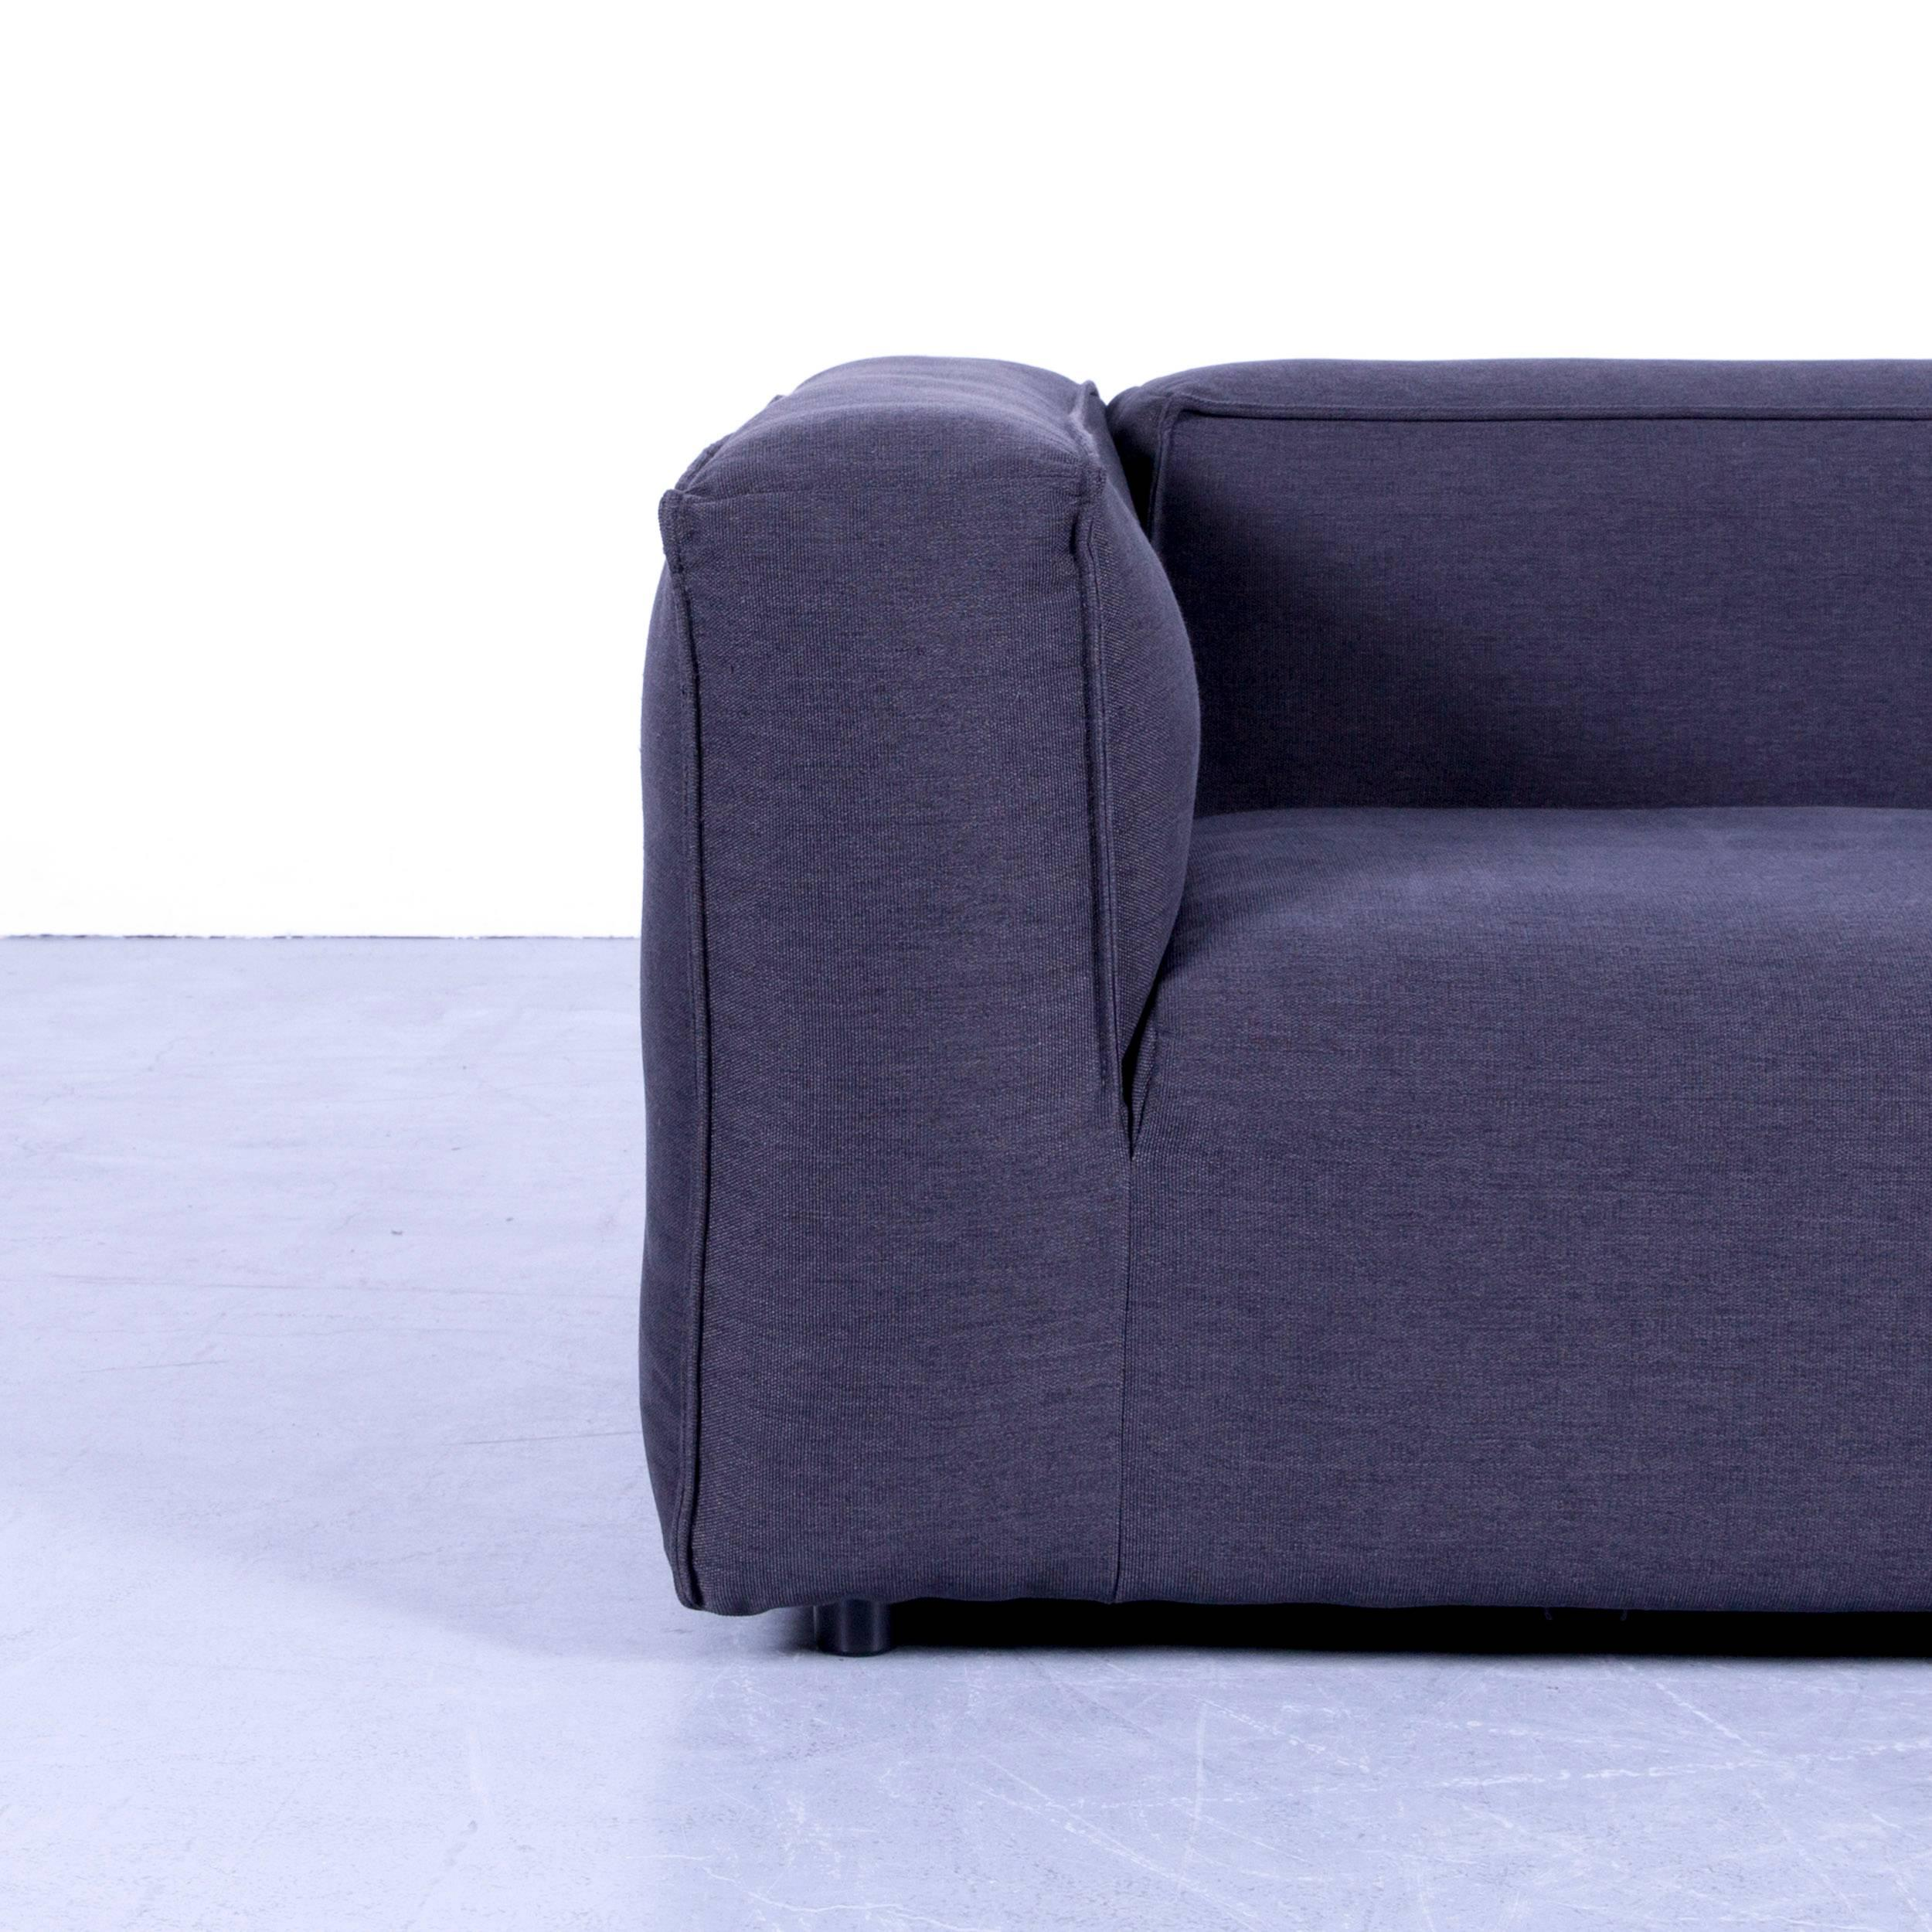 recamiere kaufen simple recamiere with recamiere kaufen. Black Bedroom Furniture Sets. Home Design Ideas